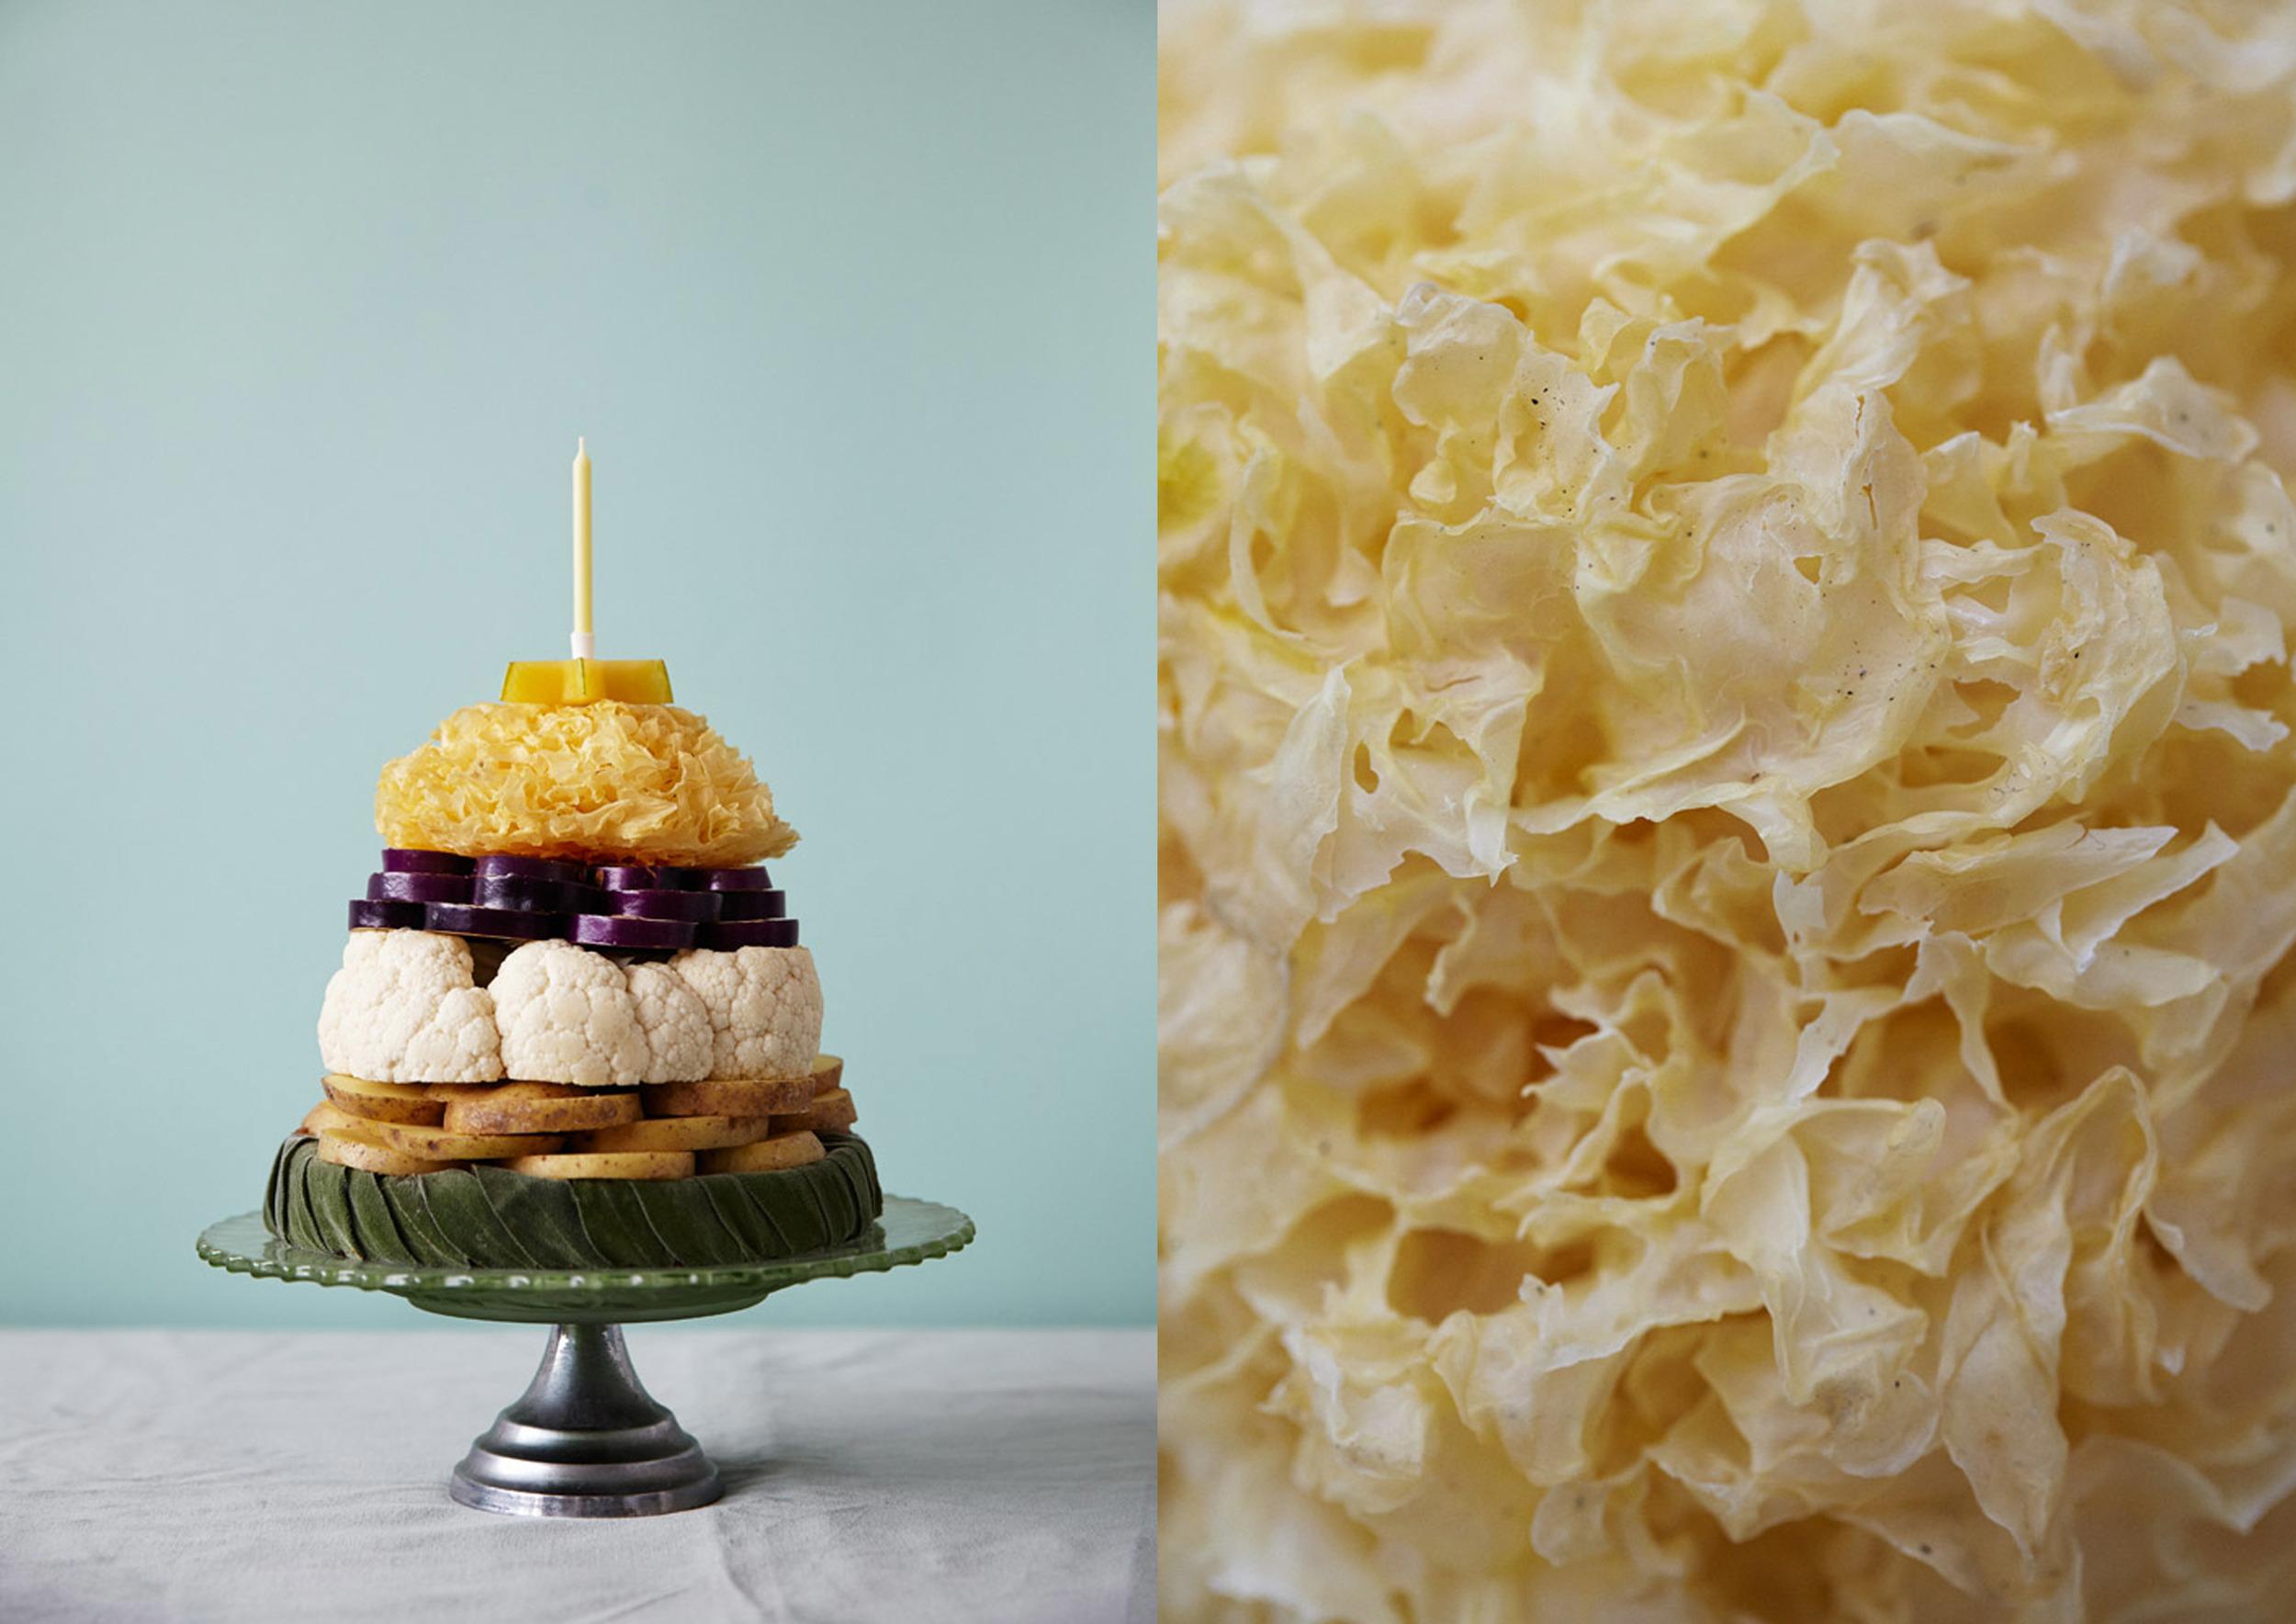 Veggie cake.jpg